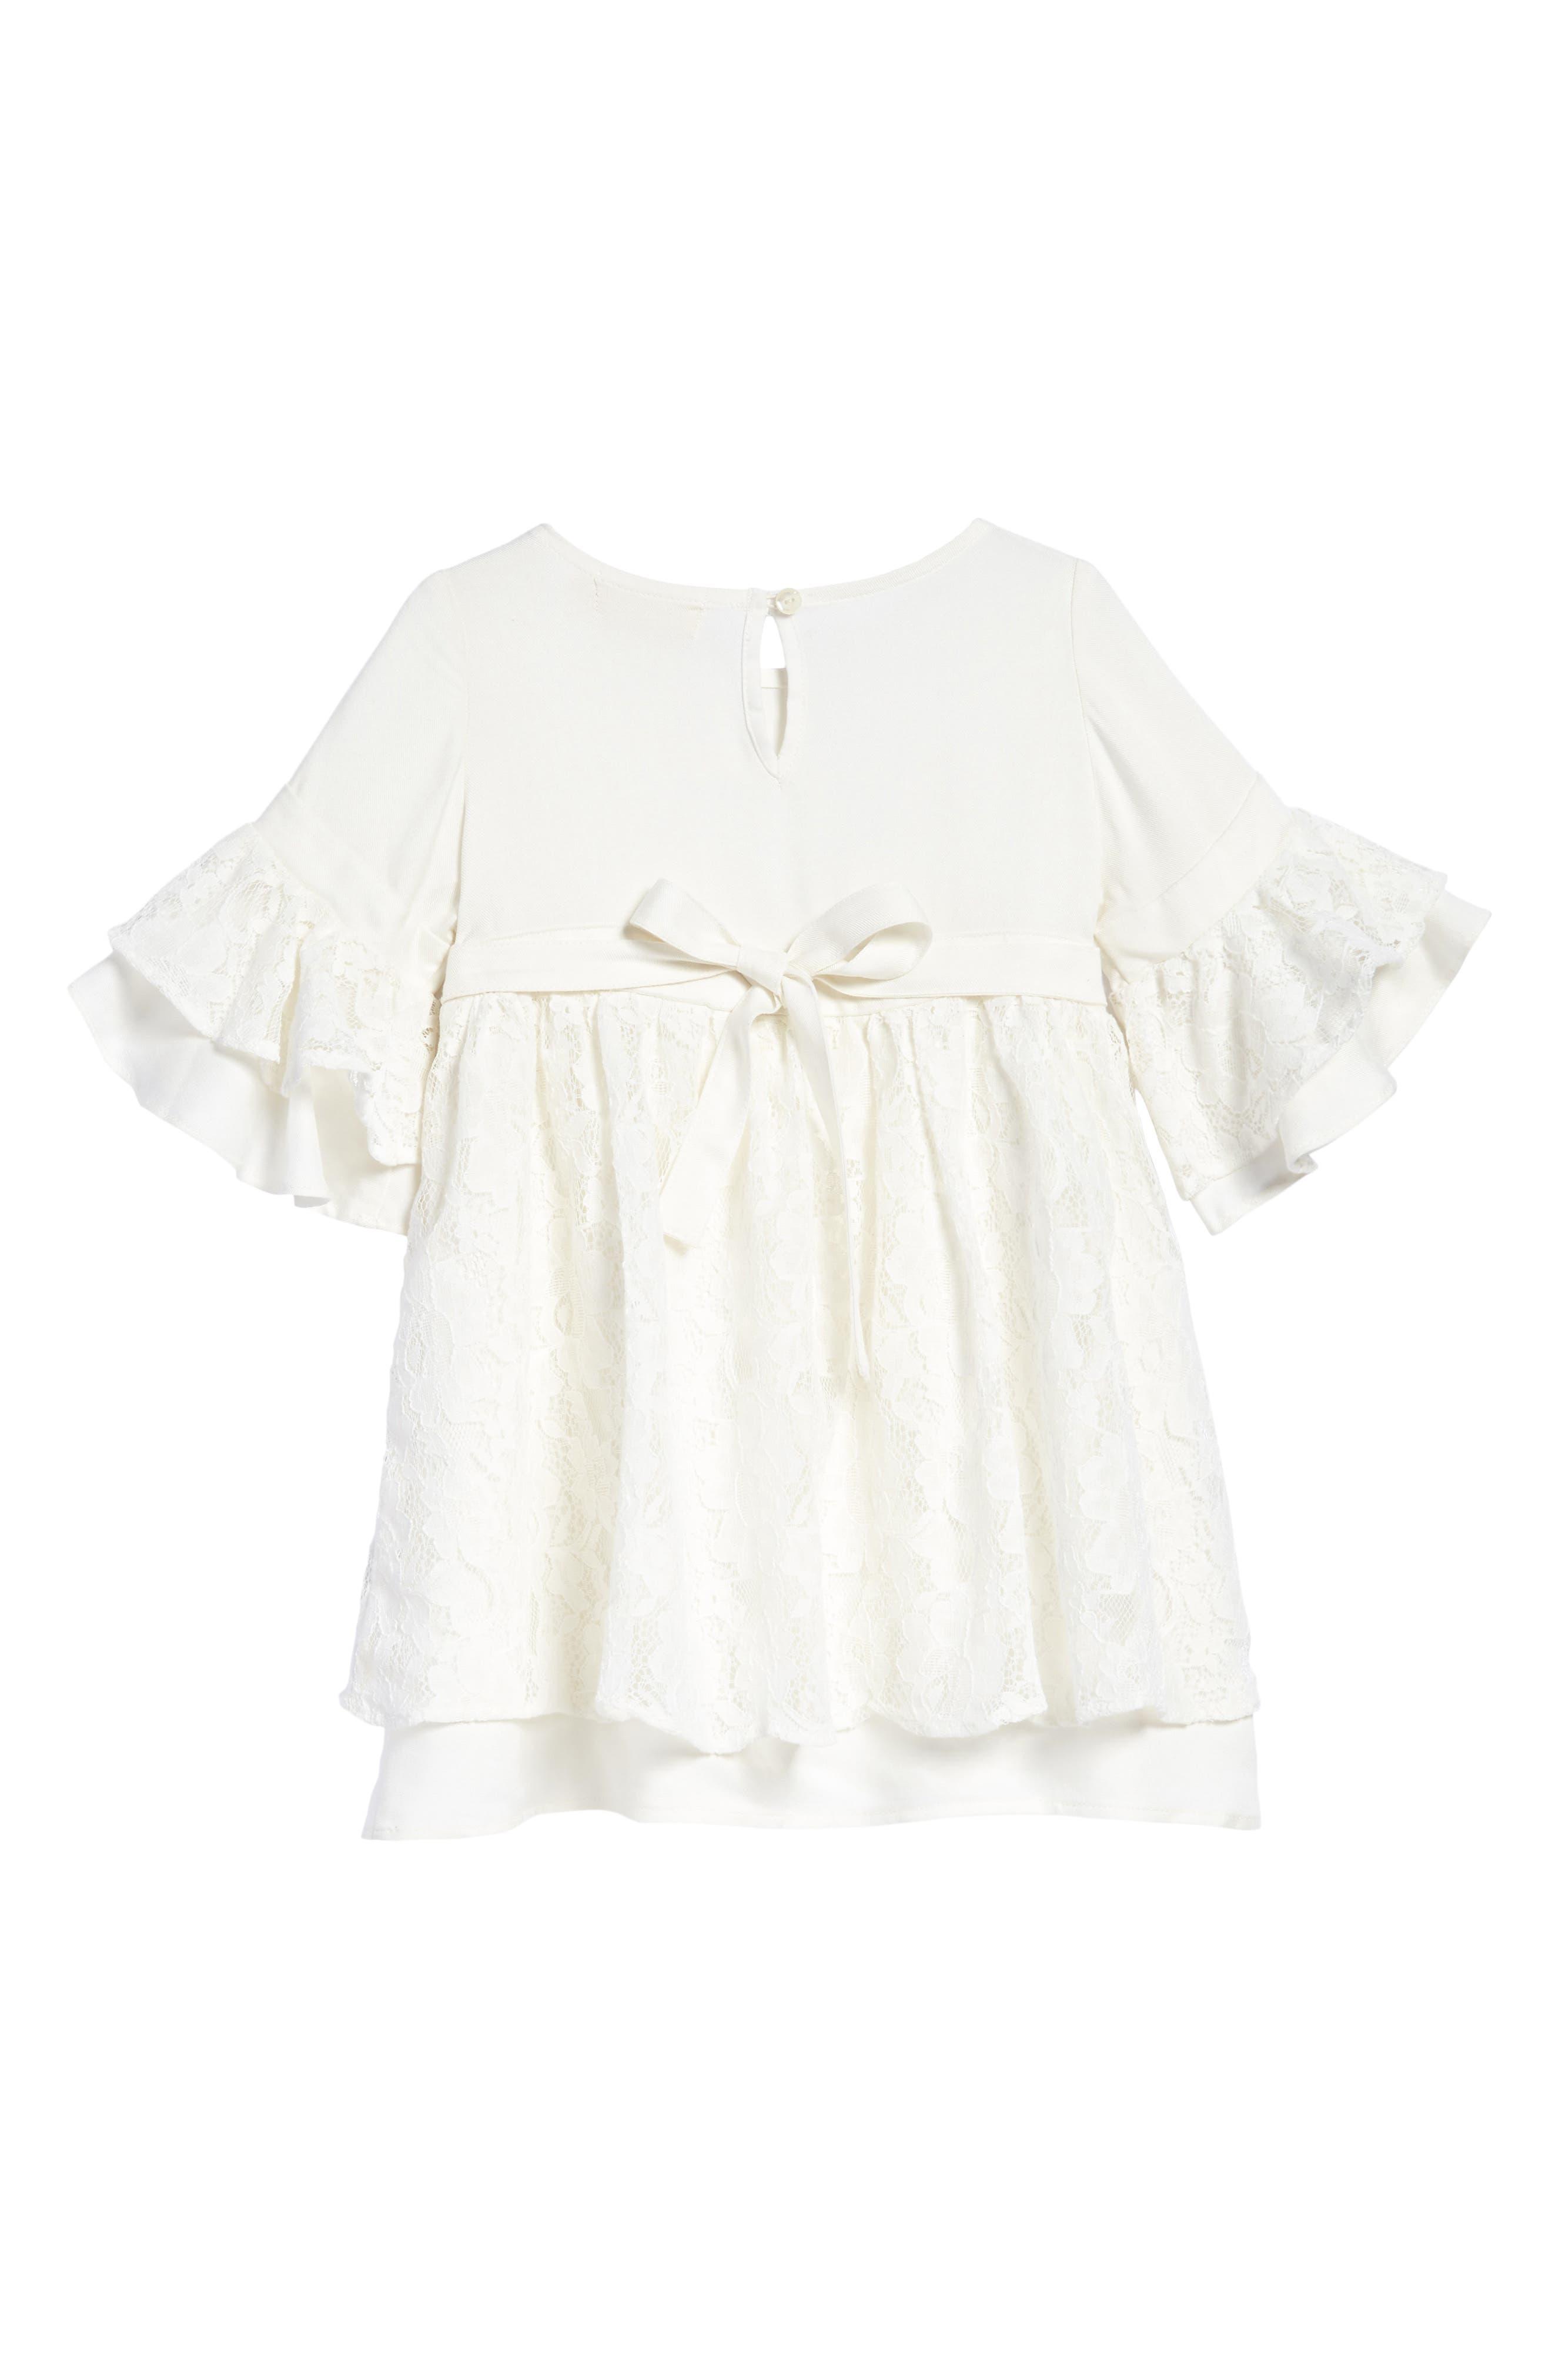 Lyla Lace Dress,                             Alternate thumbnail 2, color,                             900